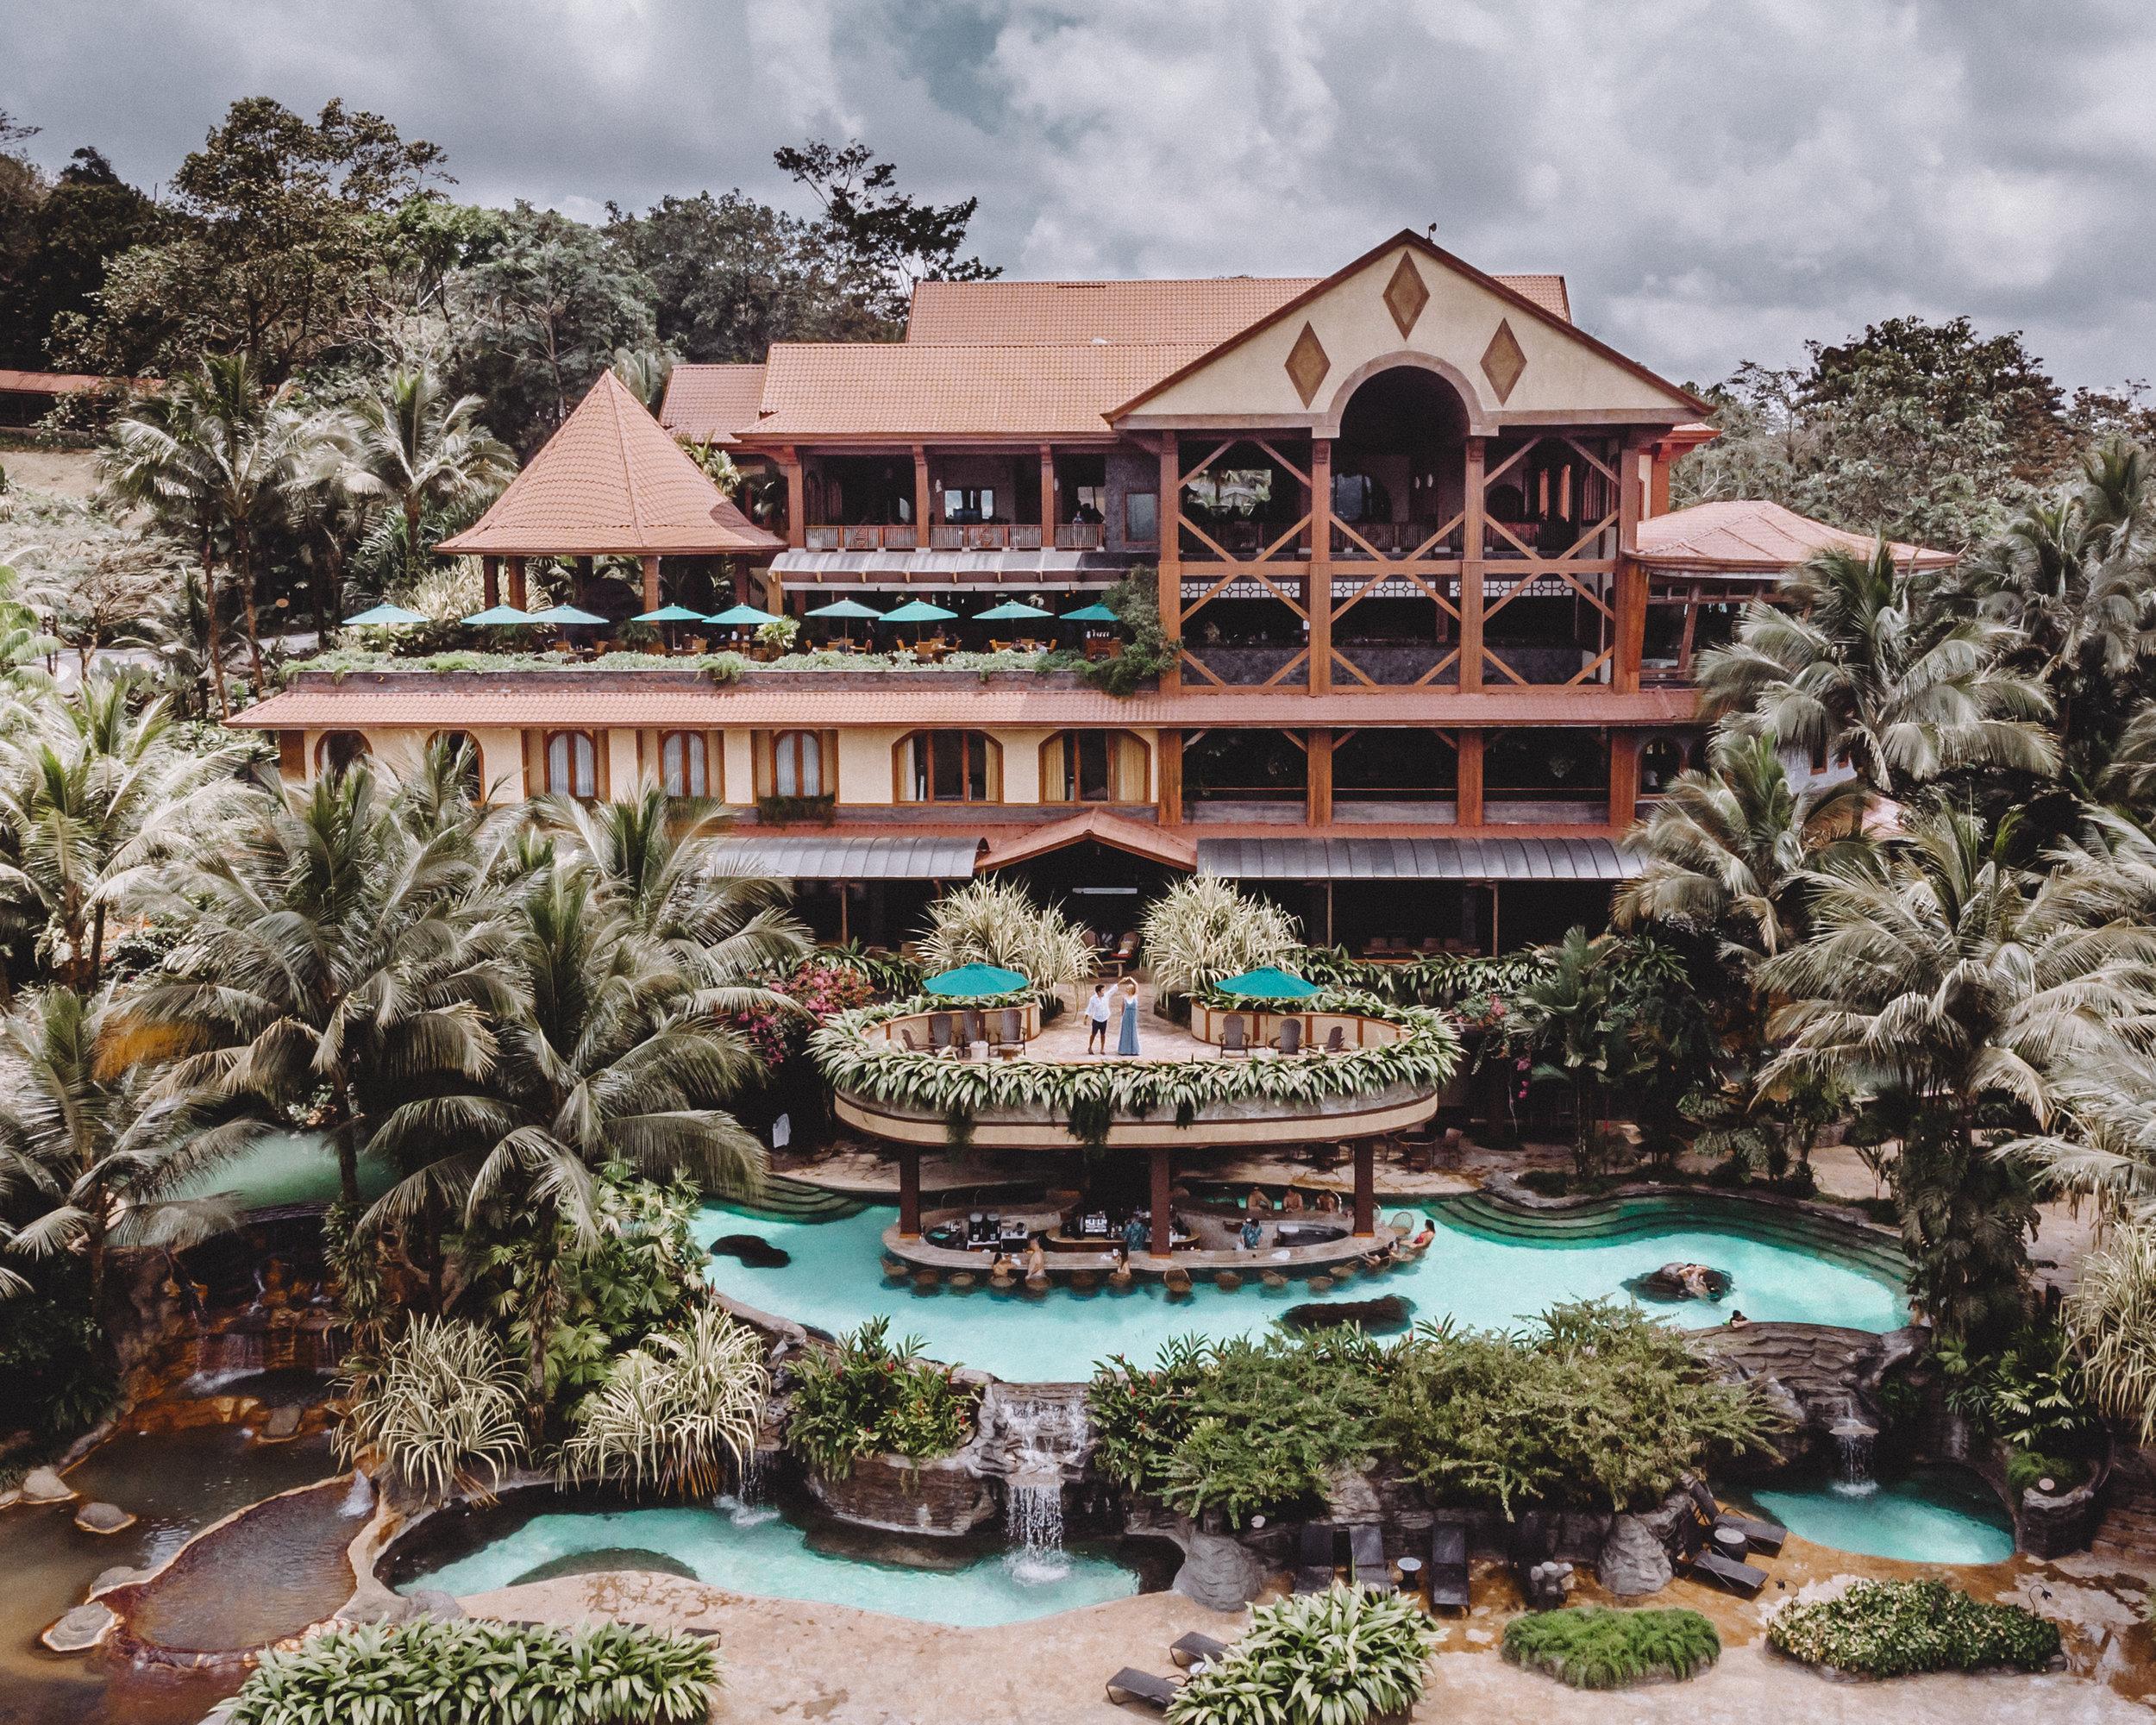 Springs Resort and Spa